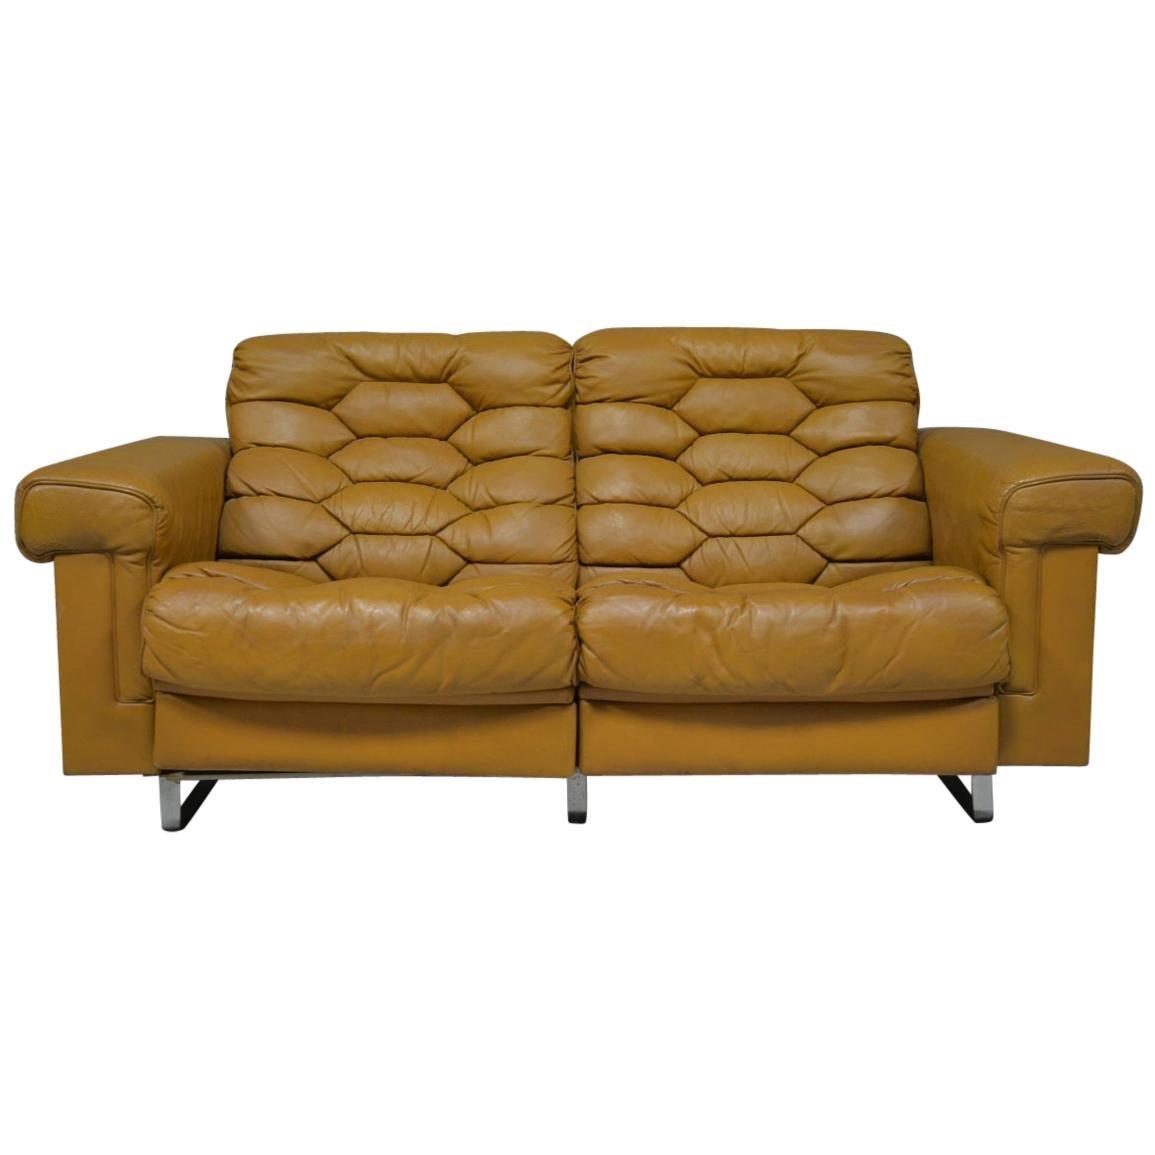 Vintage De Sede DS-P Reclining Sofa by Robert Haussmann, Switzerland, 1970s